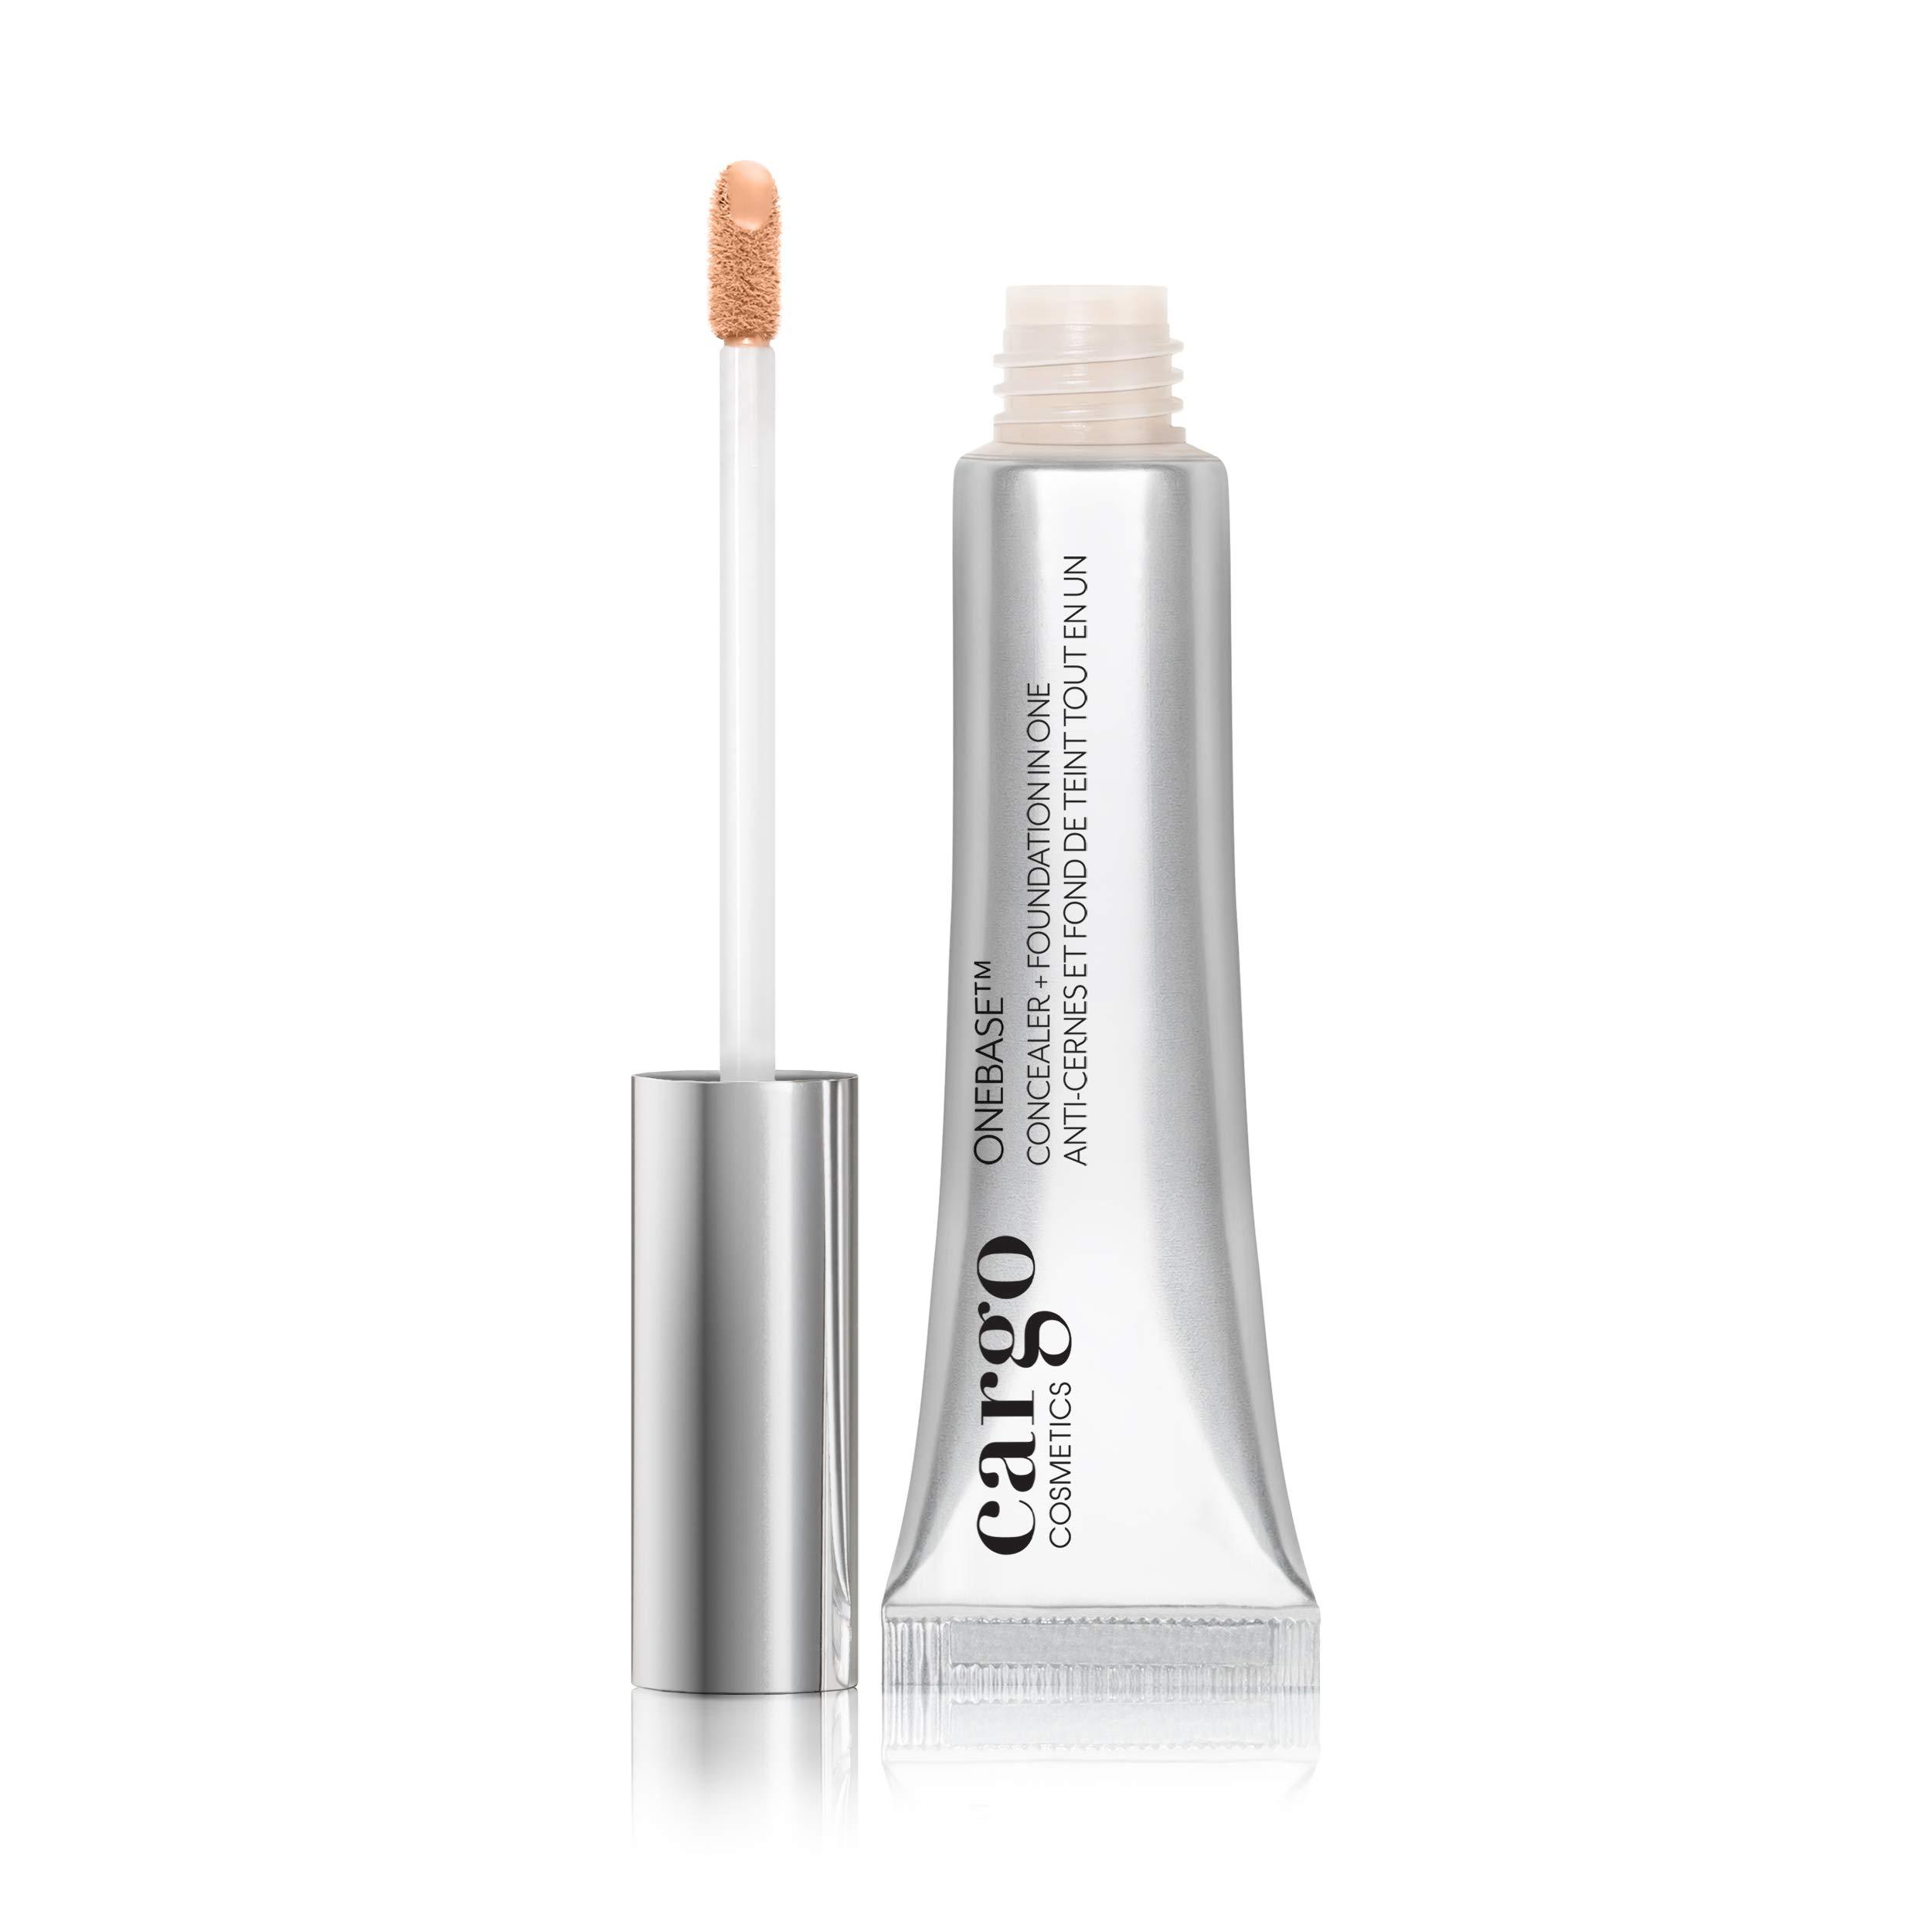 Cargo Cosmetics - OneBase Blendable Concealer + Foundation in One, Full Coverage, Under Eye Concealer, Under Eye Coverage, 02